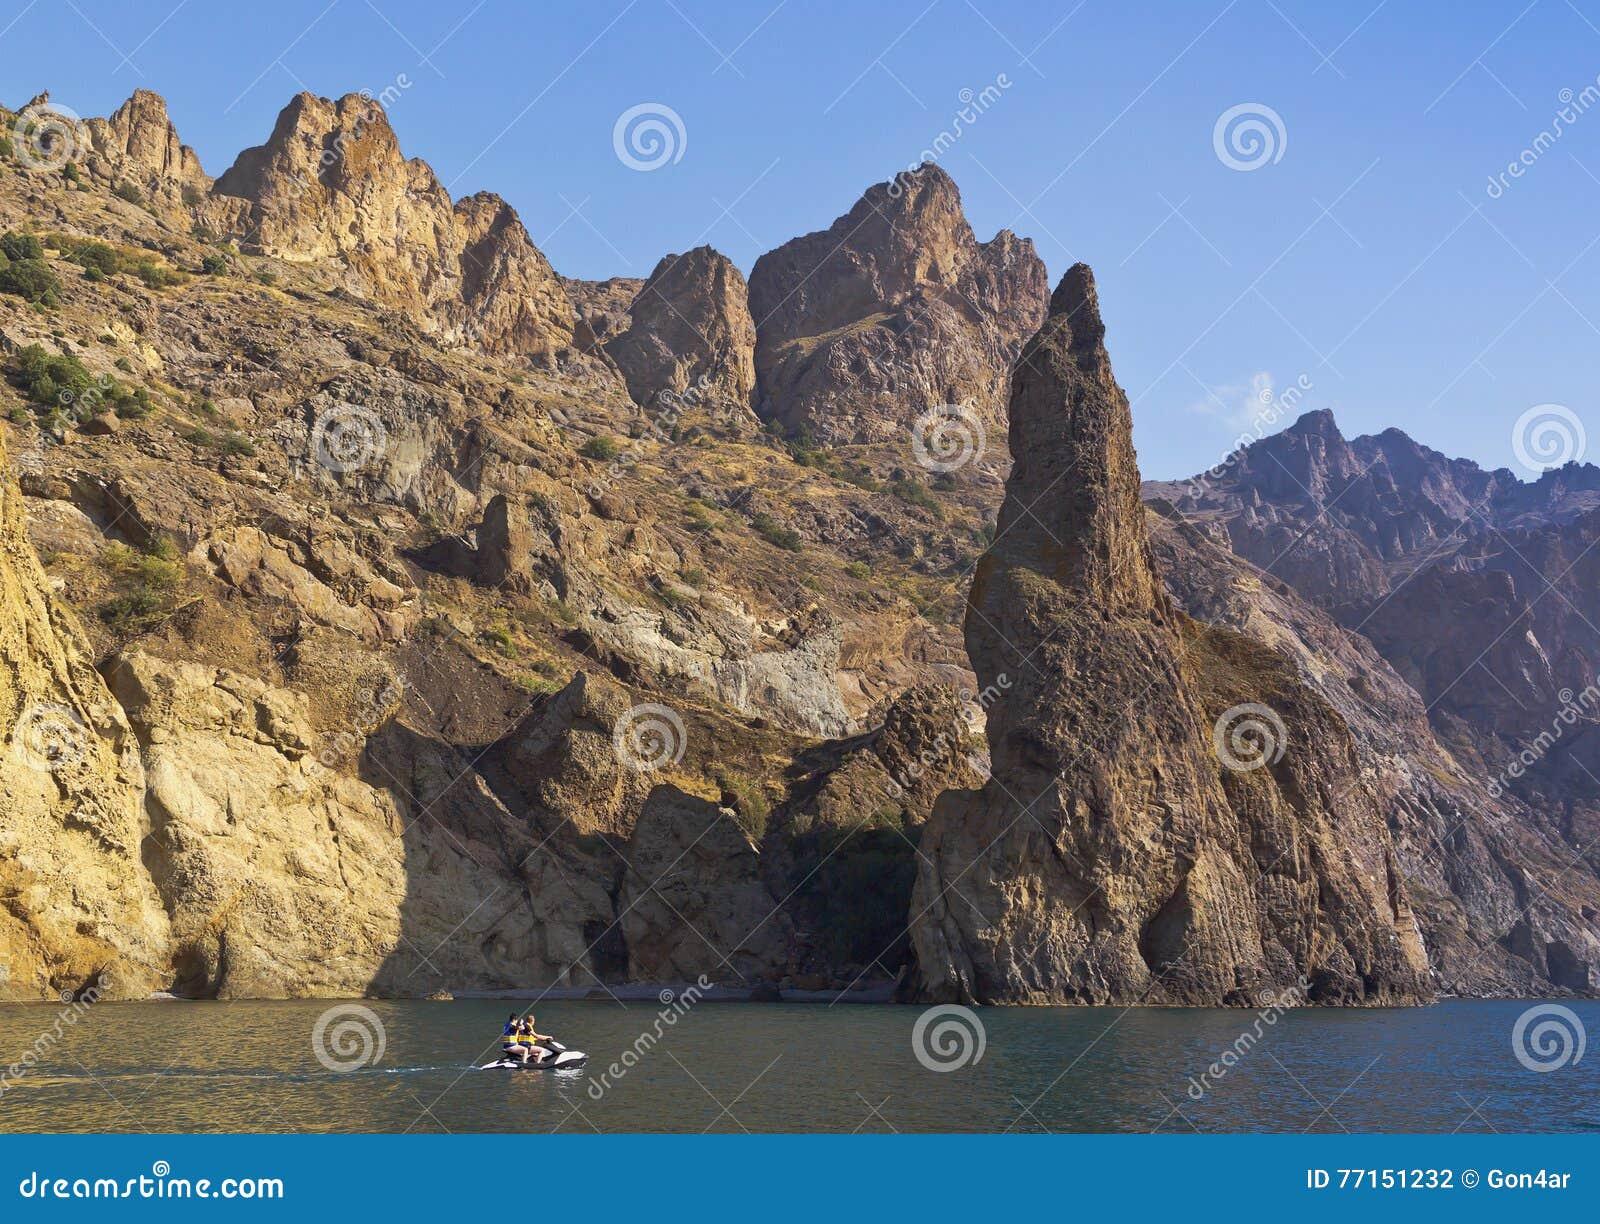 La vue de la mer aux formations de roche peu communes du Kara-Dag